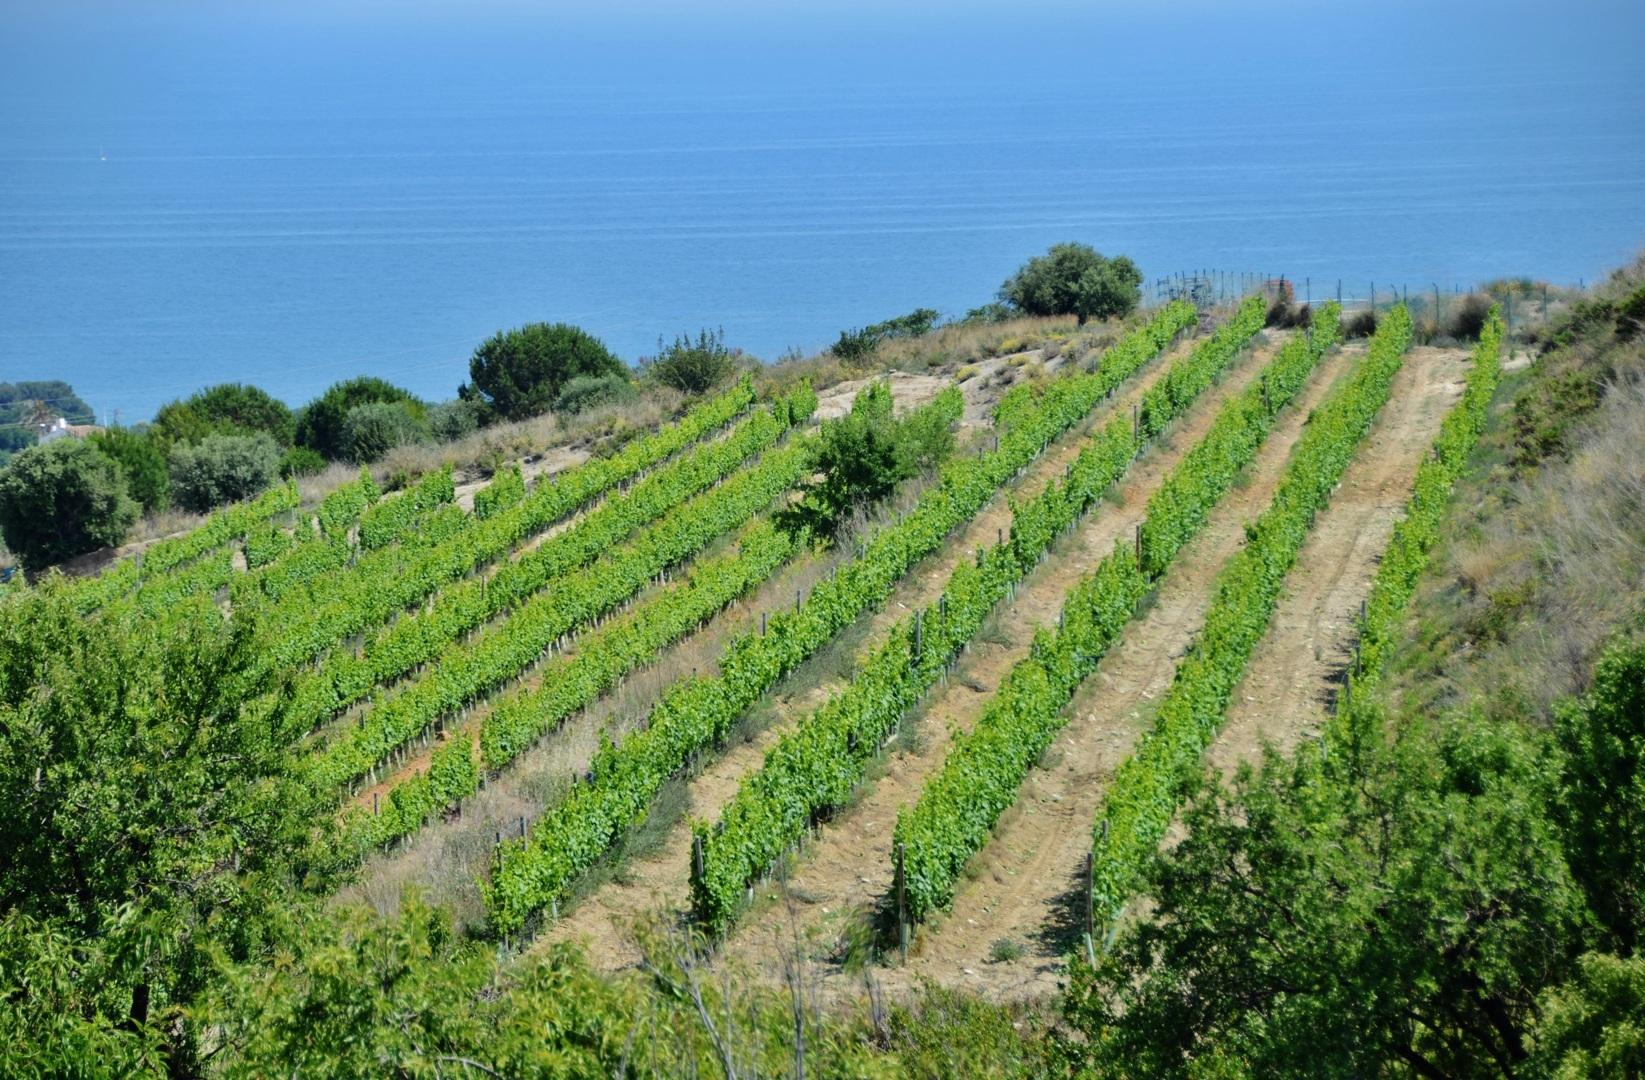 Vinyes d'Alella